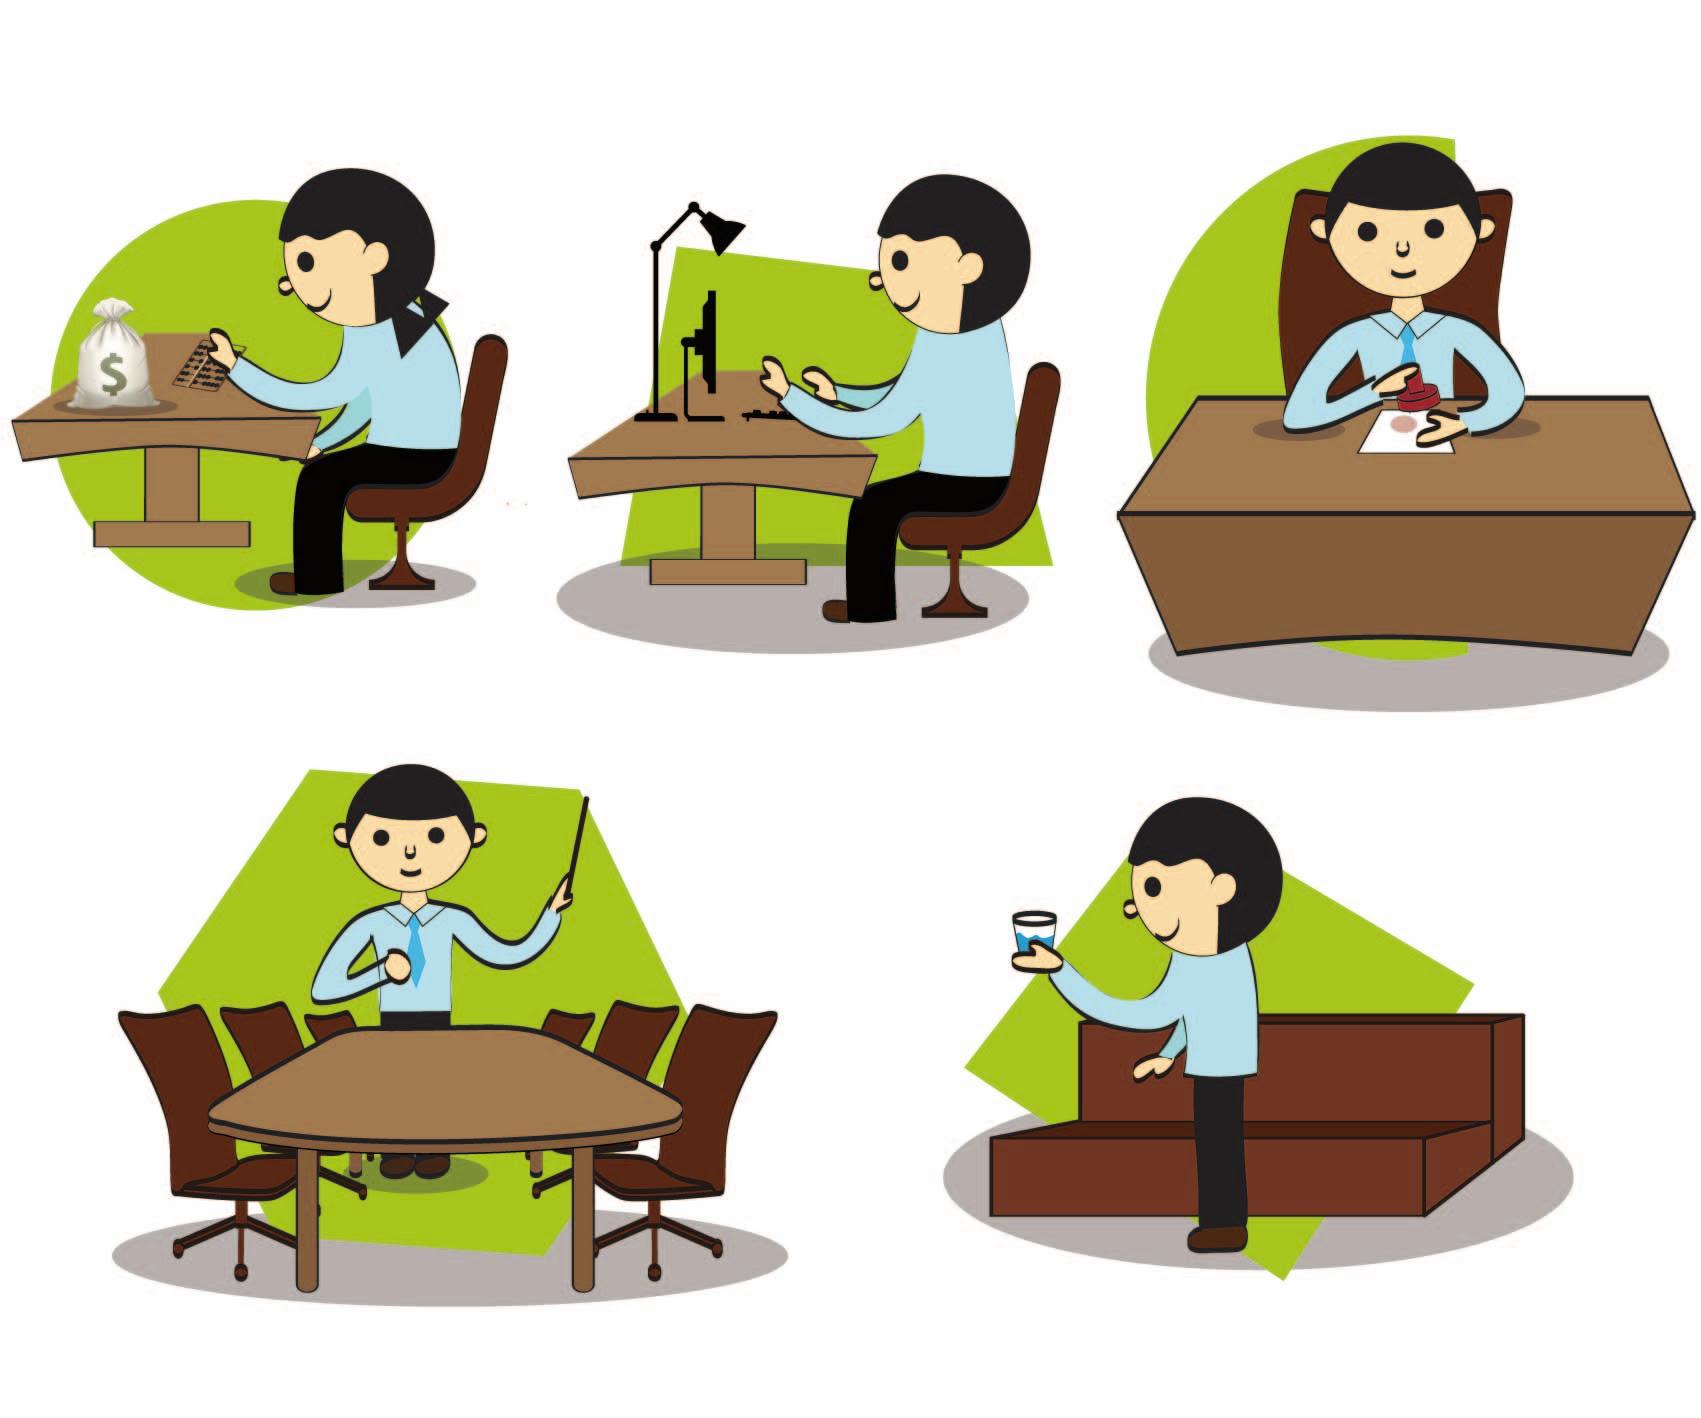 Koleksi 7700  Gambar Animasi Orang Kerja Di Kantor  Gratis